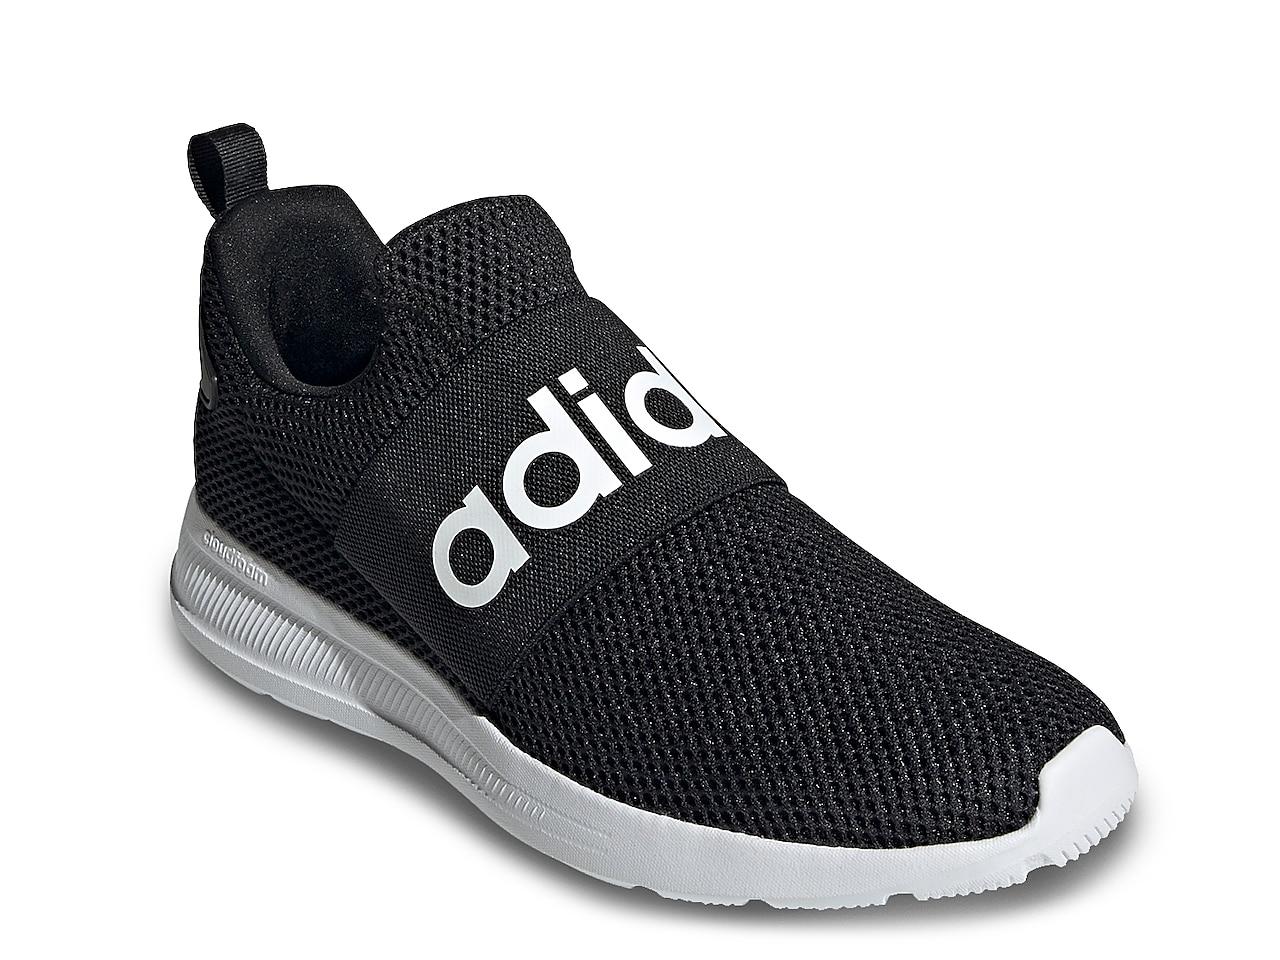 adidas Lite Racer Adapt 4.0 Running Shoe - Men's